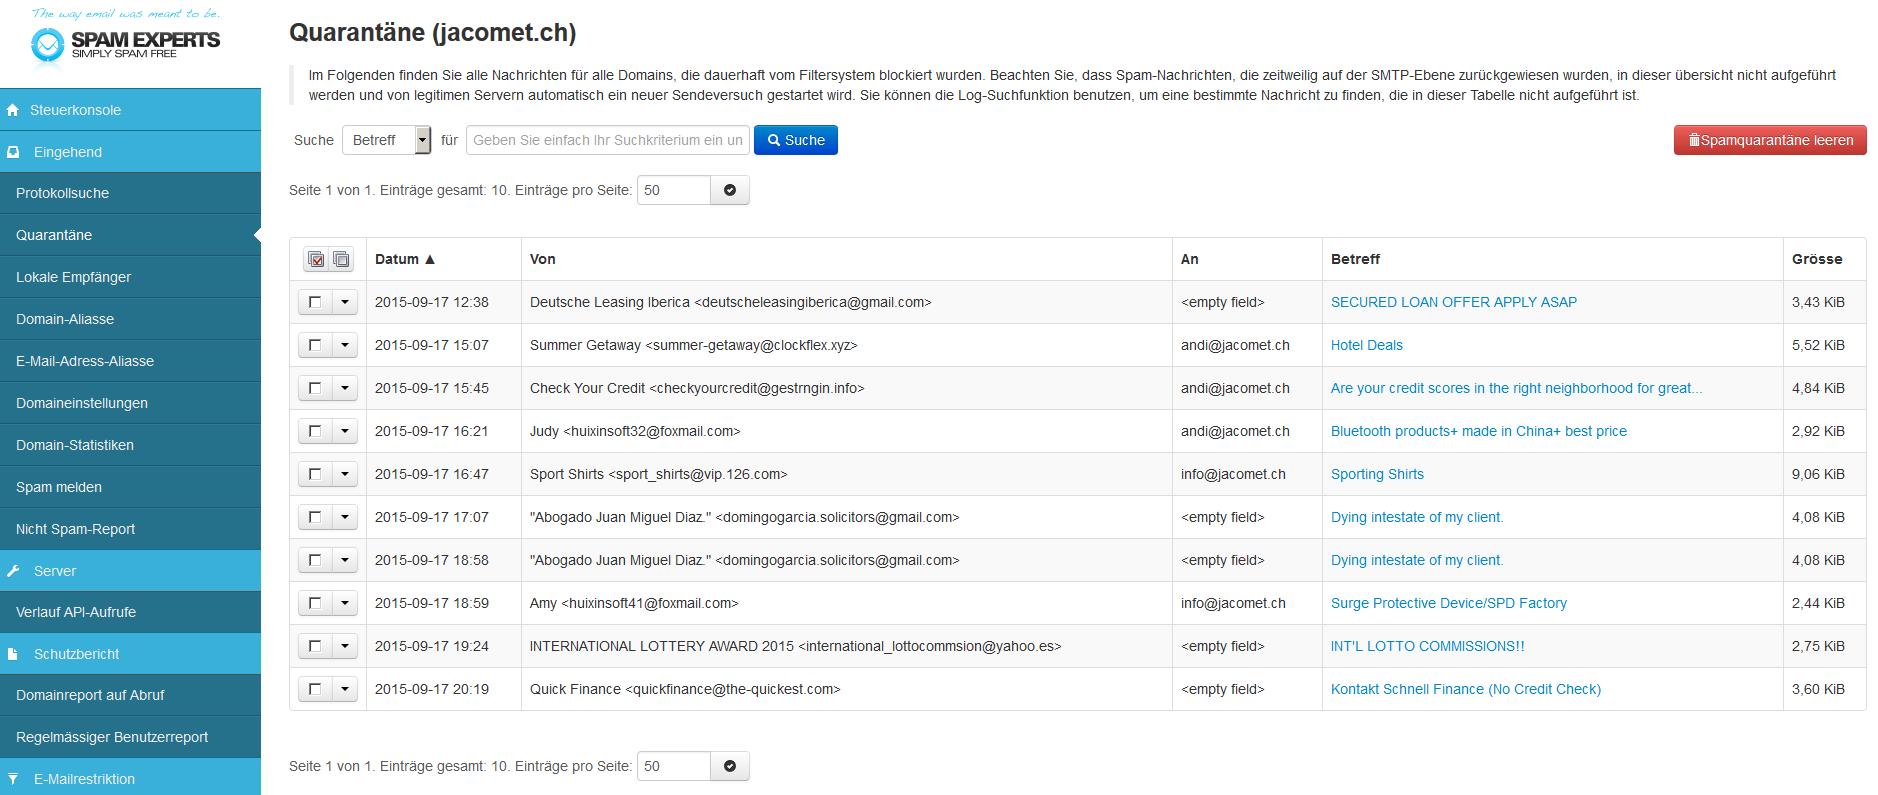 03-spamfilter-03-quarantaene-uebersicht